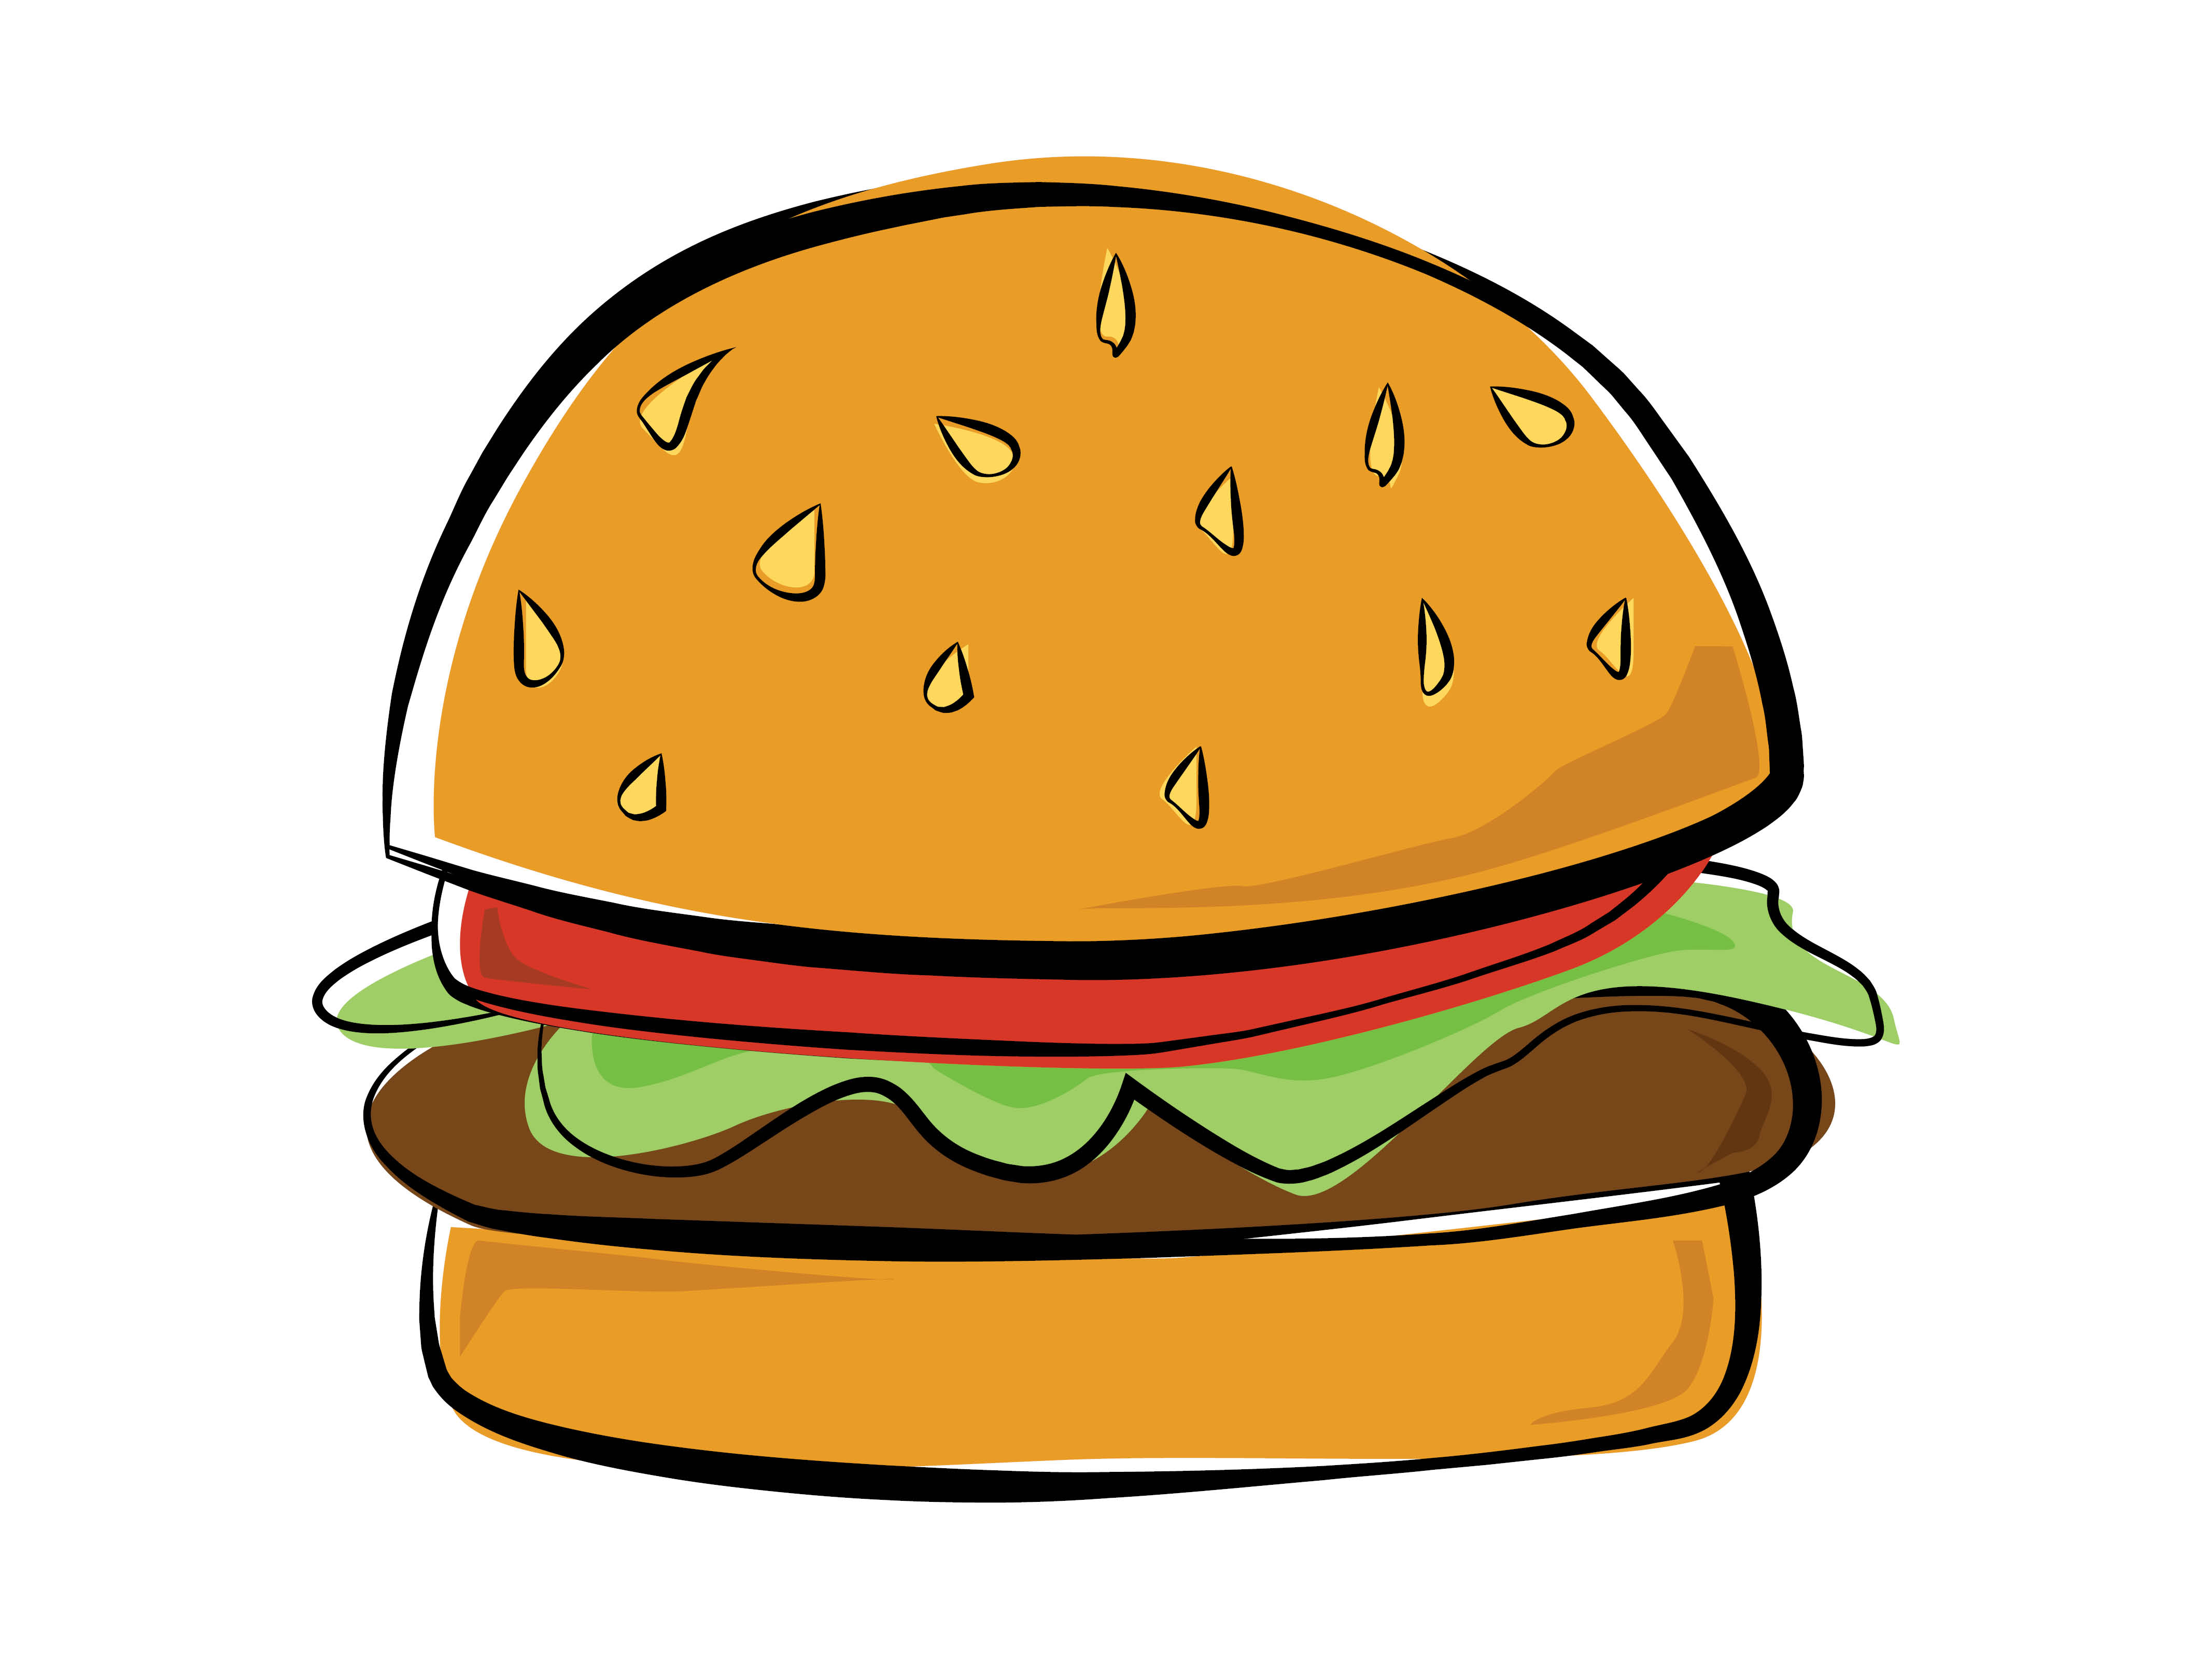 Burger clipart easy. Drawing at getdrawings com